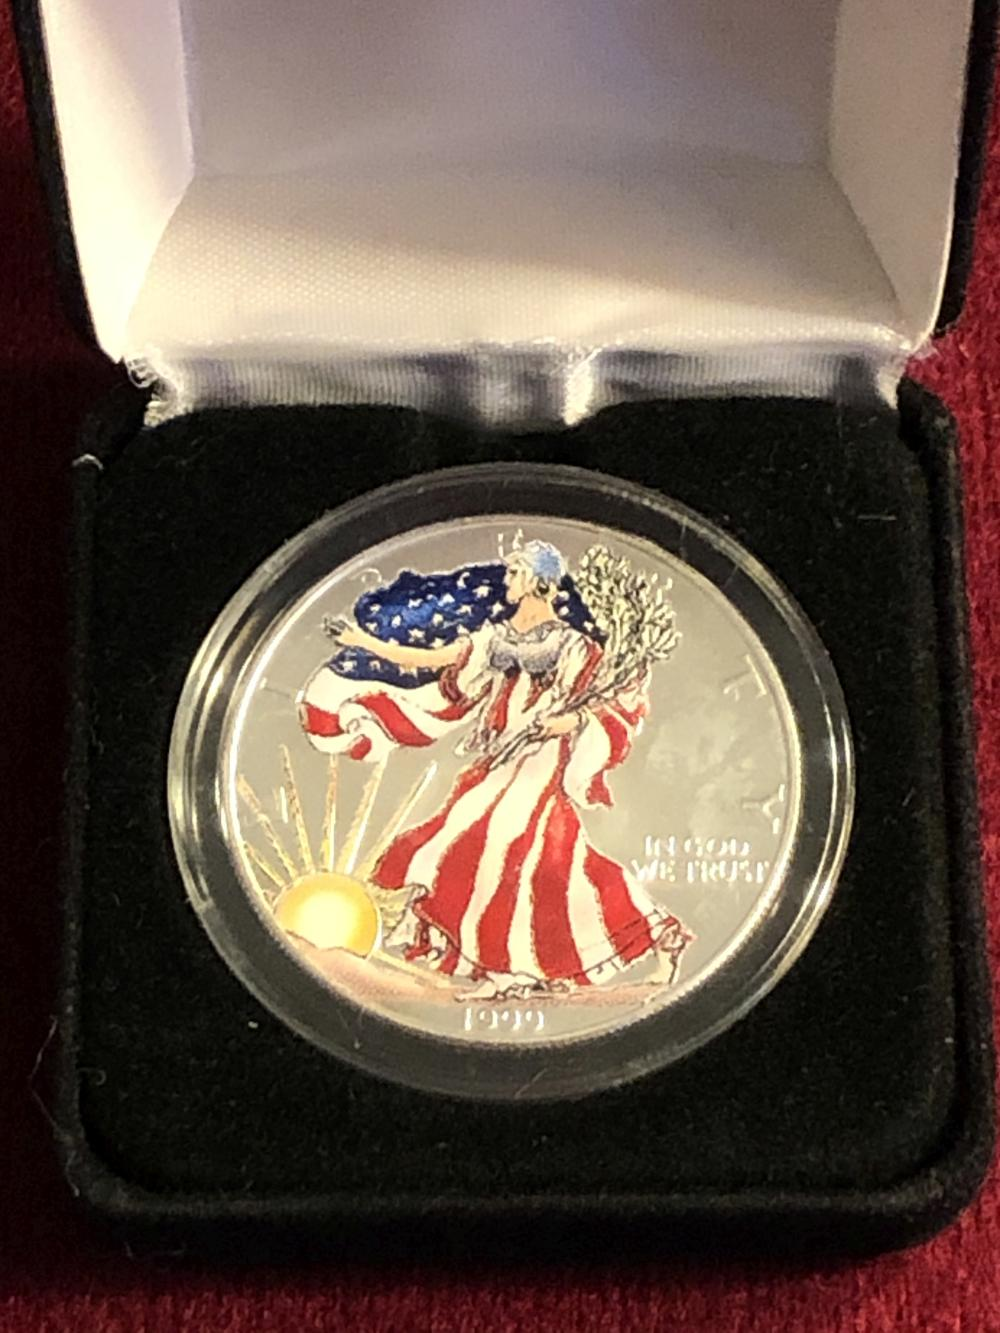 1999 last millennium silver dollar coin